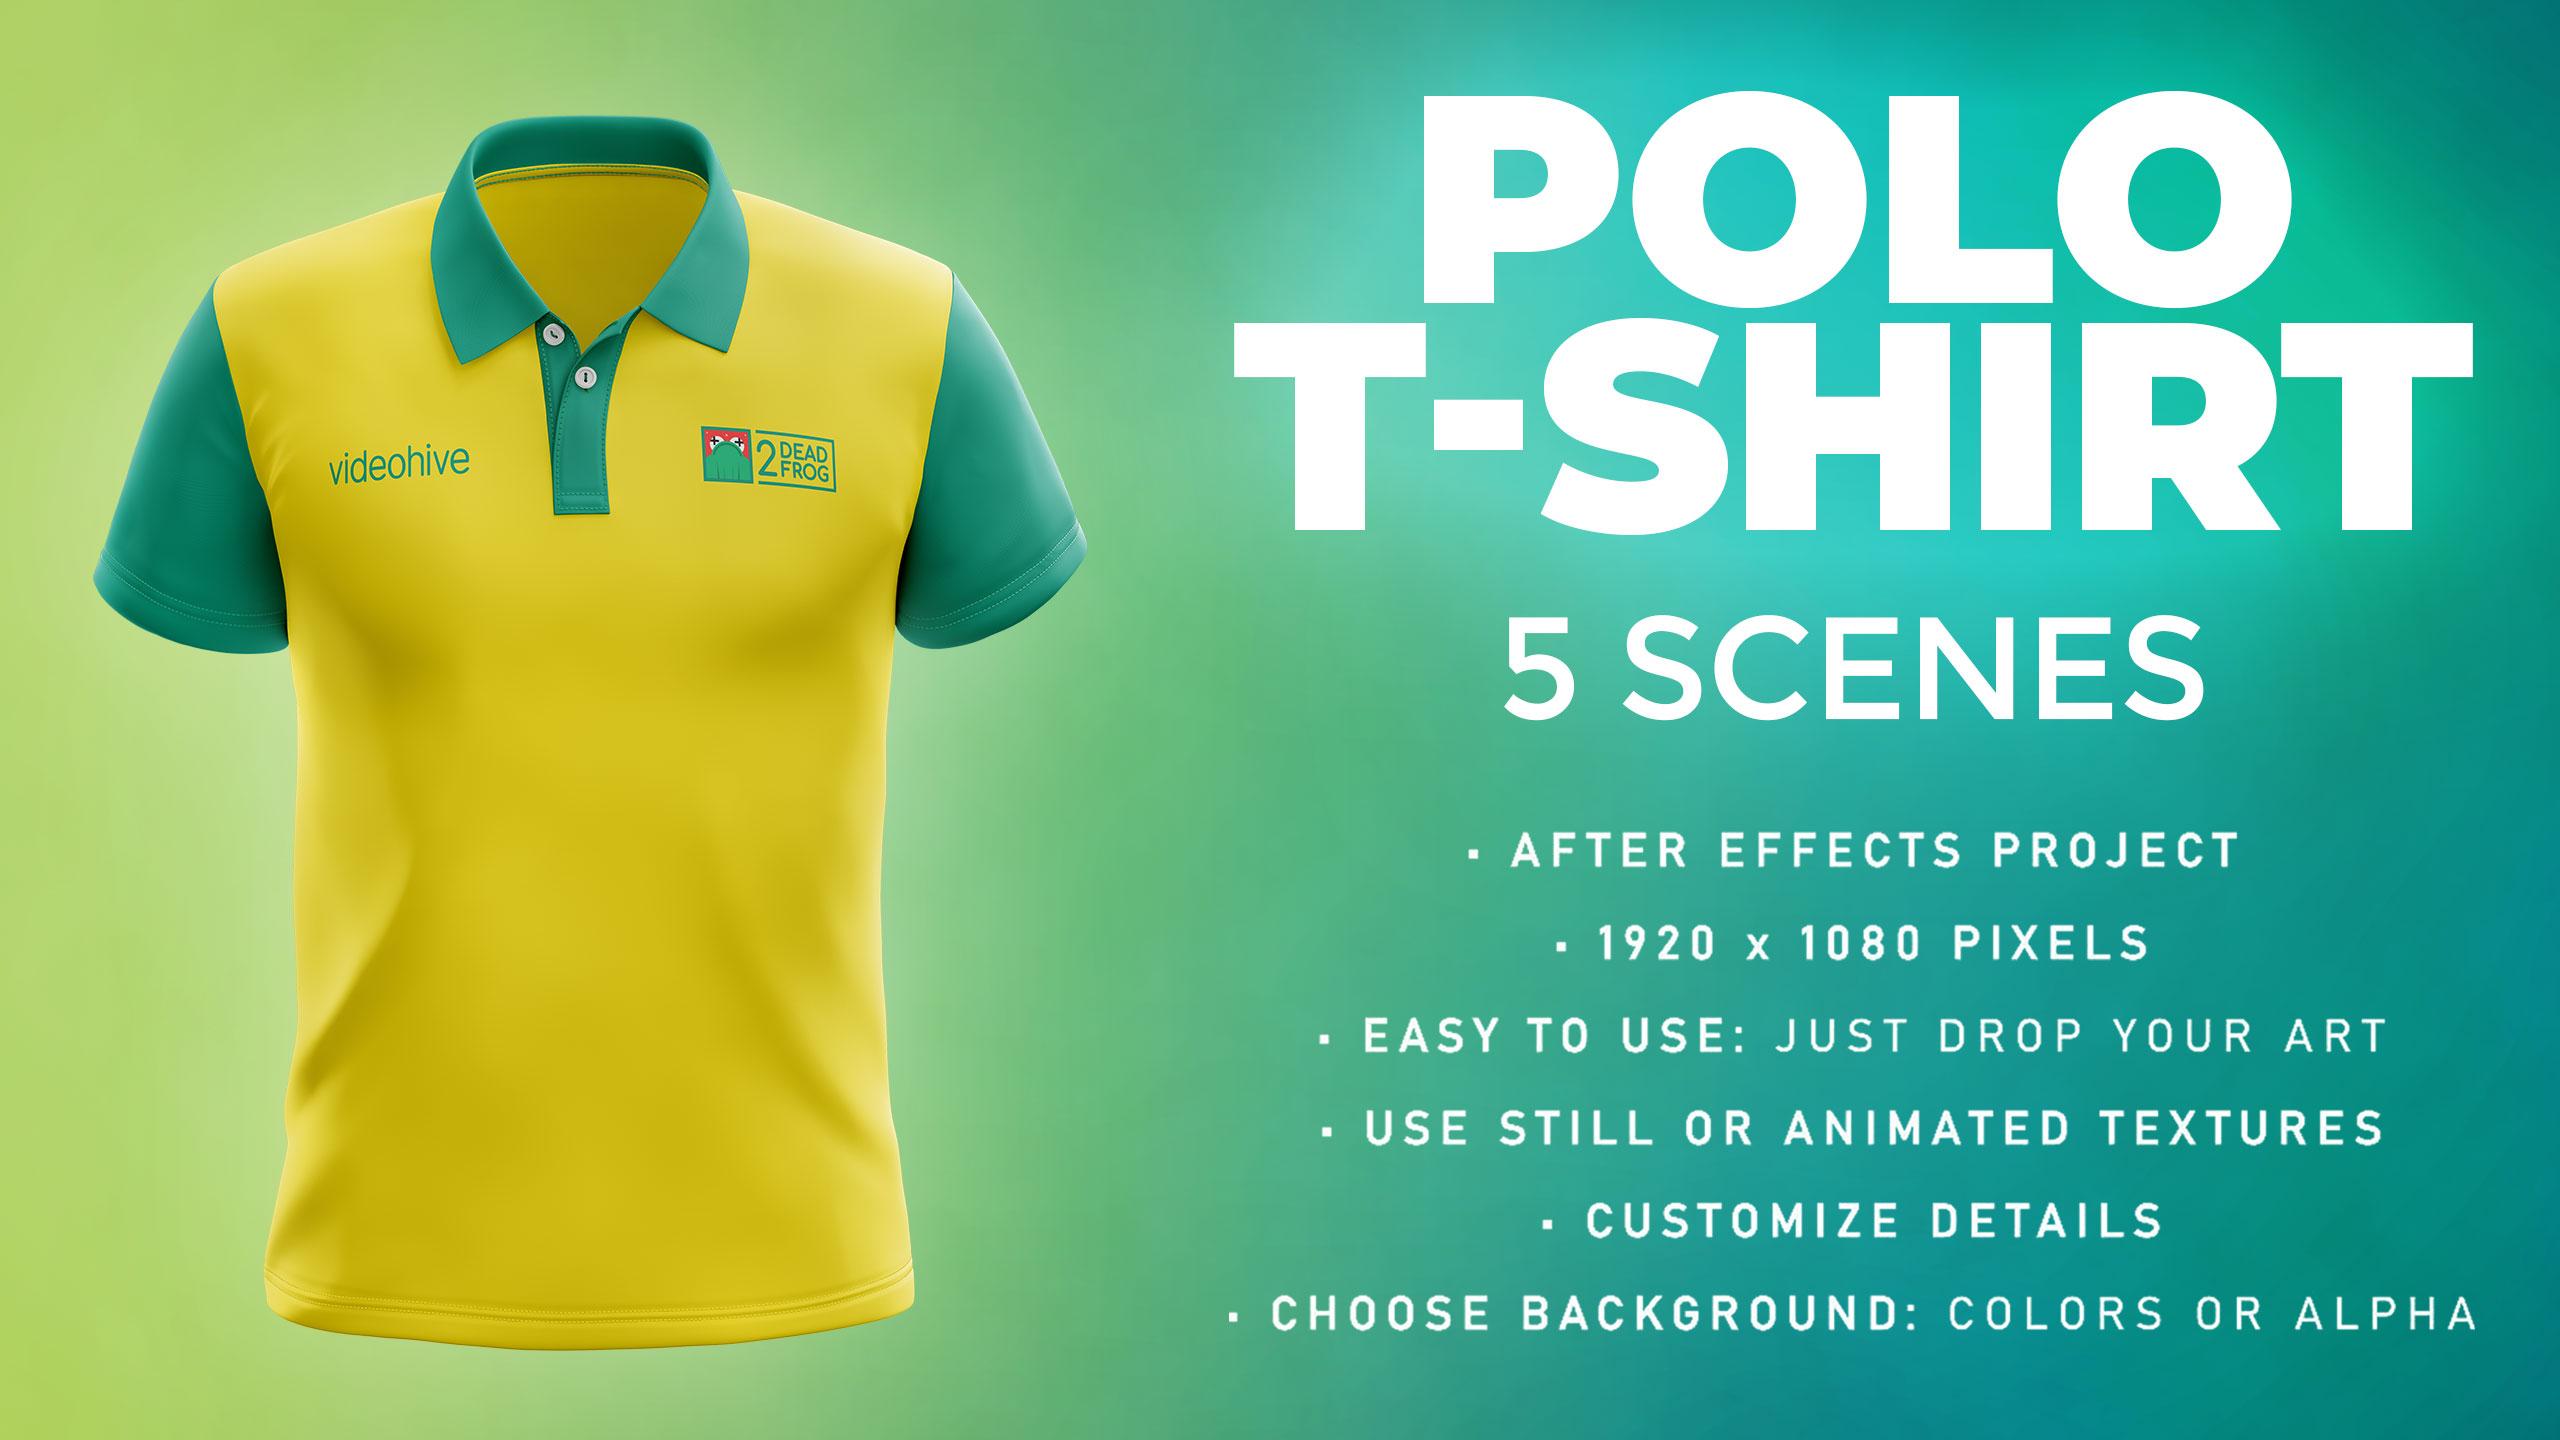 Polo T-shirt - 5 Scenes Mockup Template - Animated Mockup PRO - 1